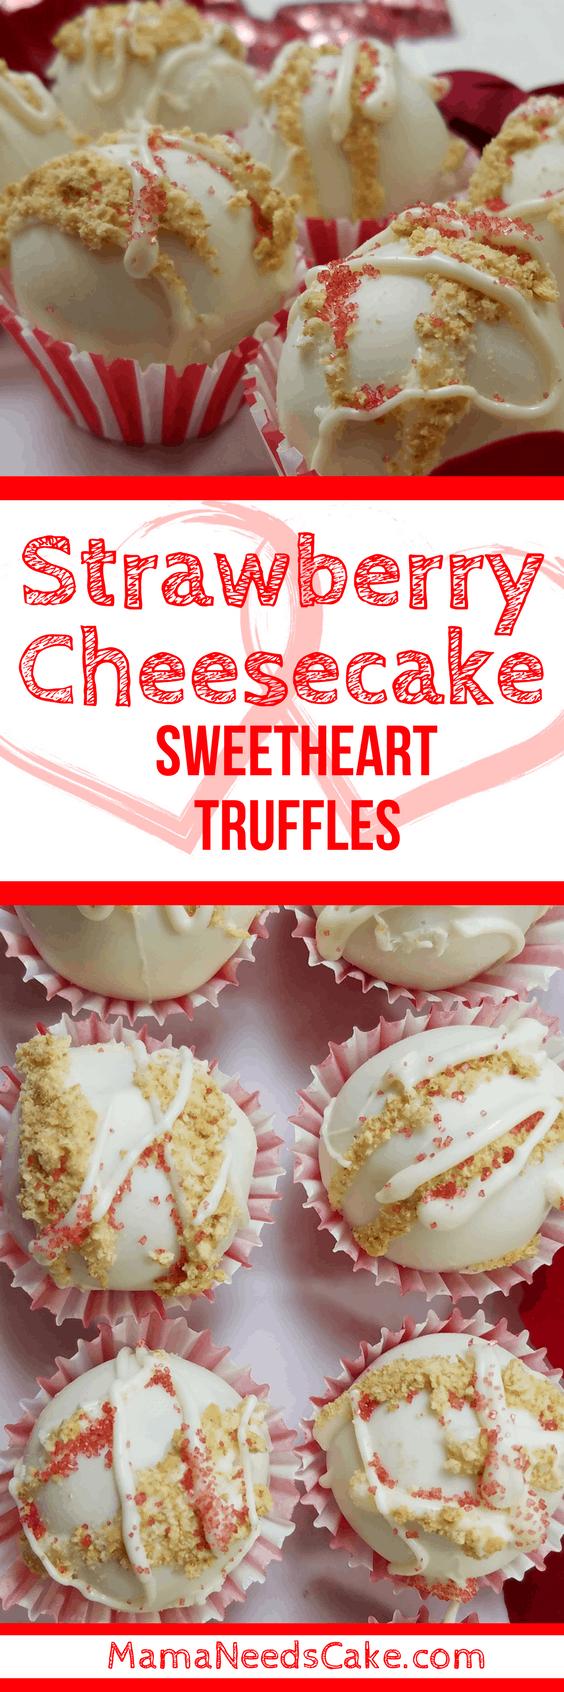 Strawberry Cheesecake Sweetheart Truffles